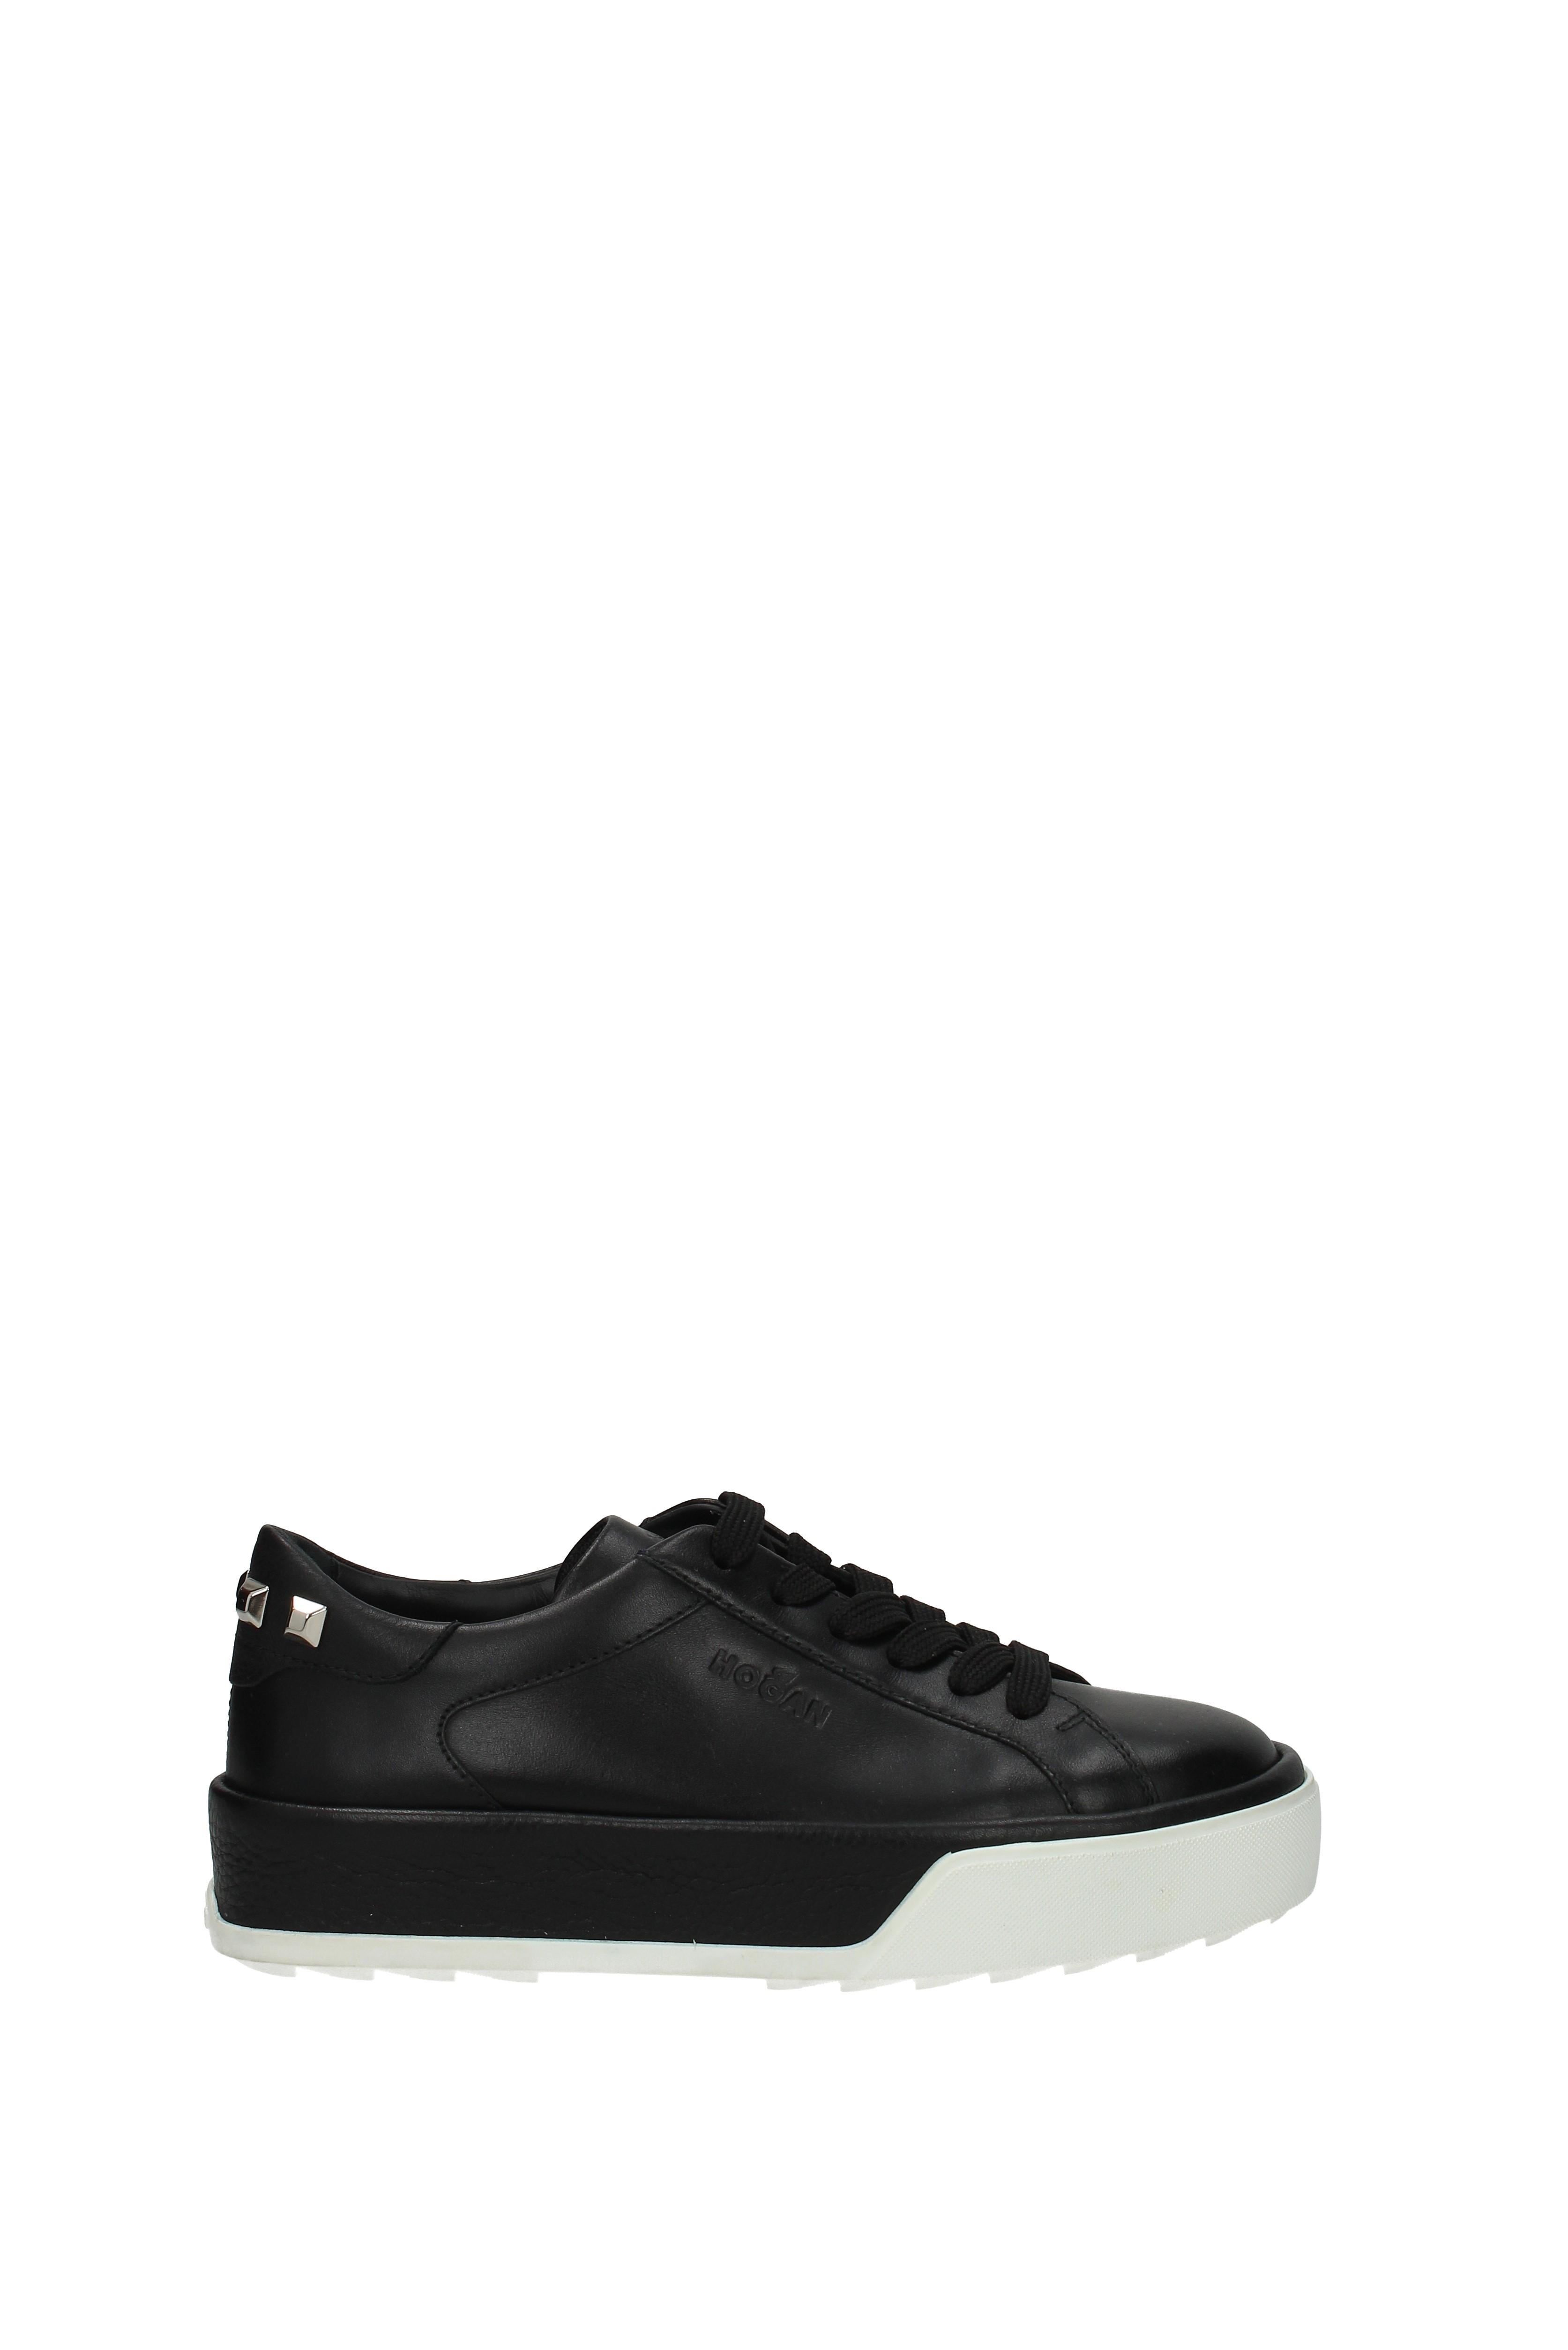 Sneakers Hogan Damenschuhe - Pelle Pelle - (HXW3200J020HNY) d9e331